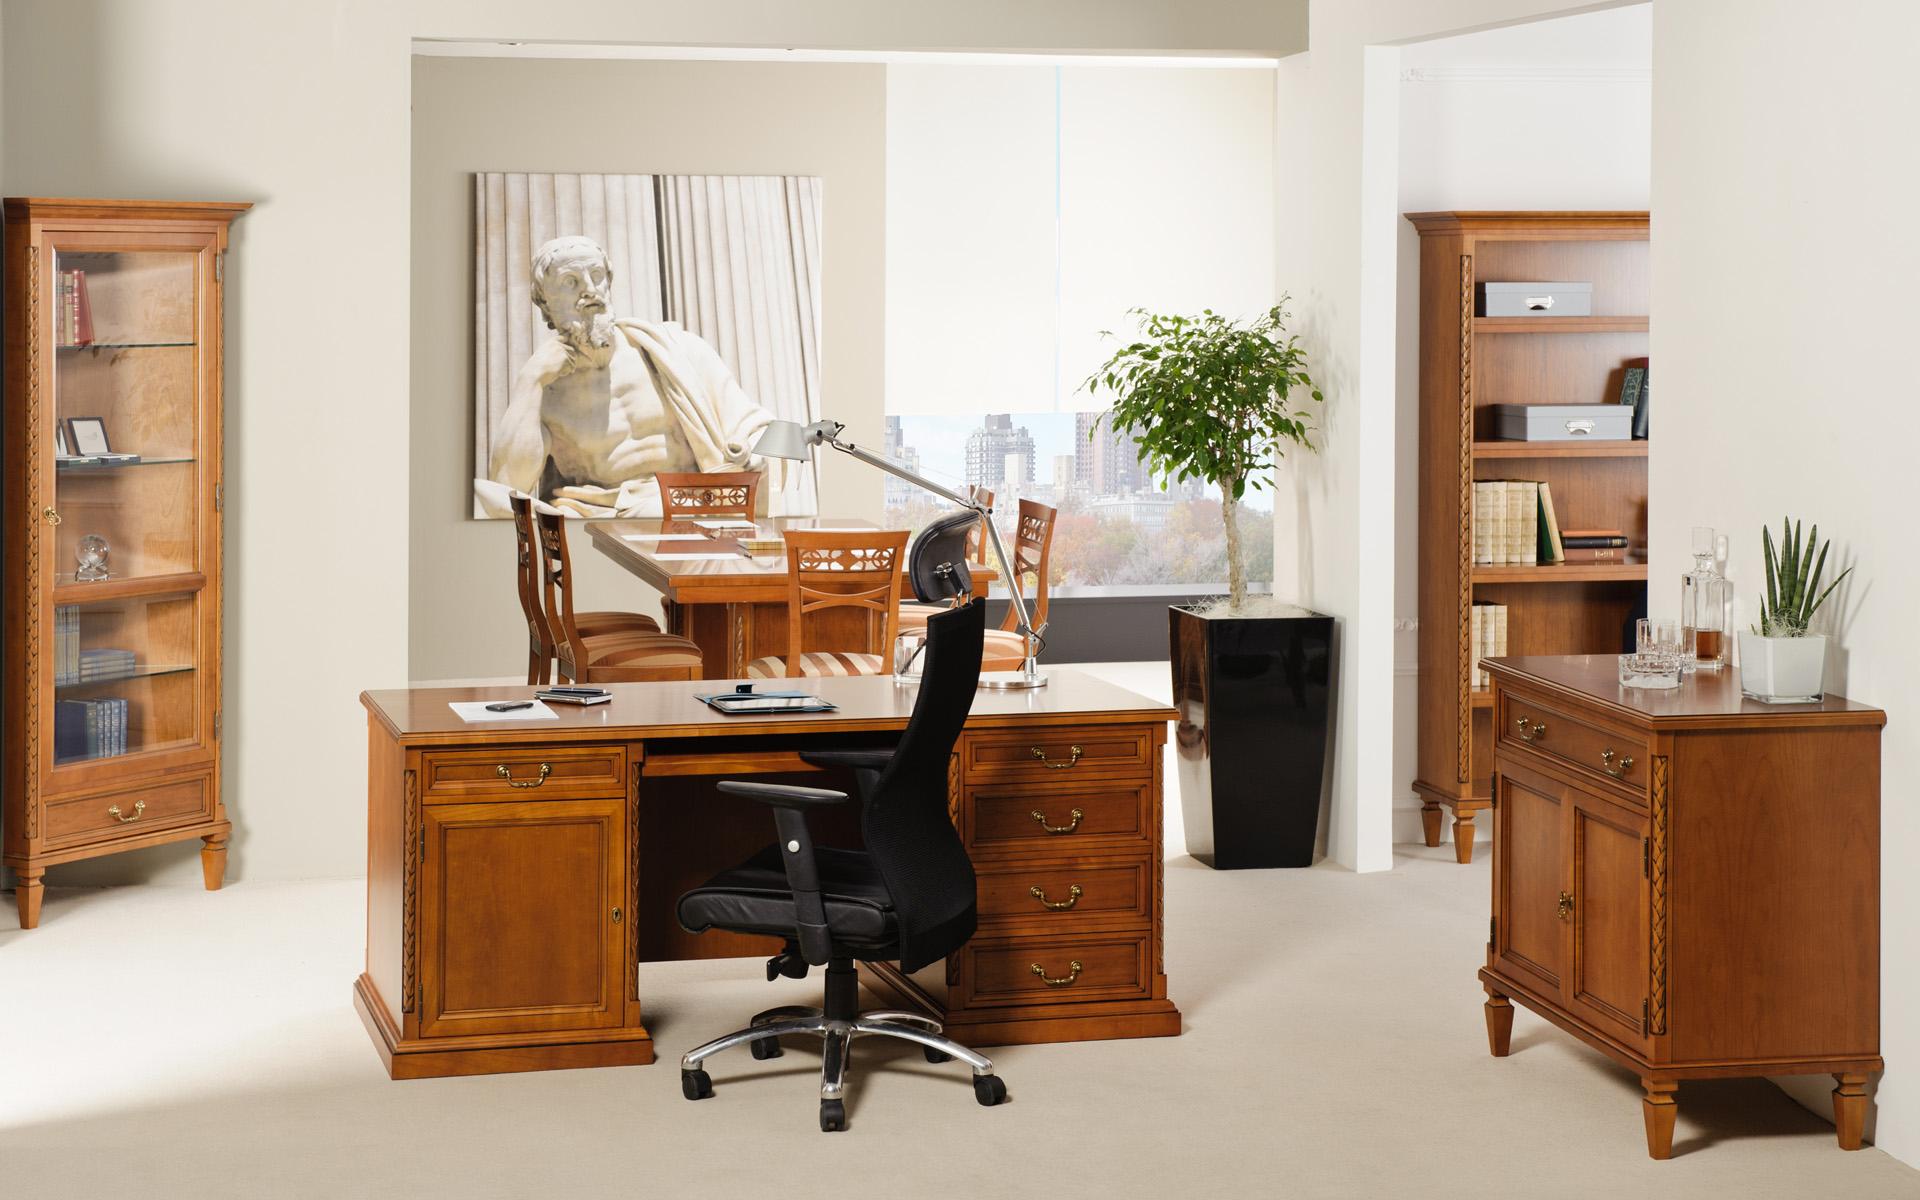 pisarna_office_Empire_klasicno-pohistvo_classic-furniture_Klassische-Moebel_1